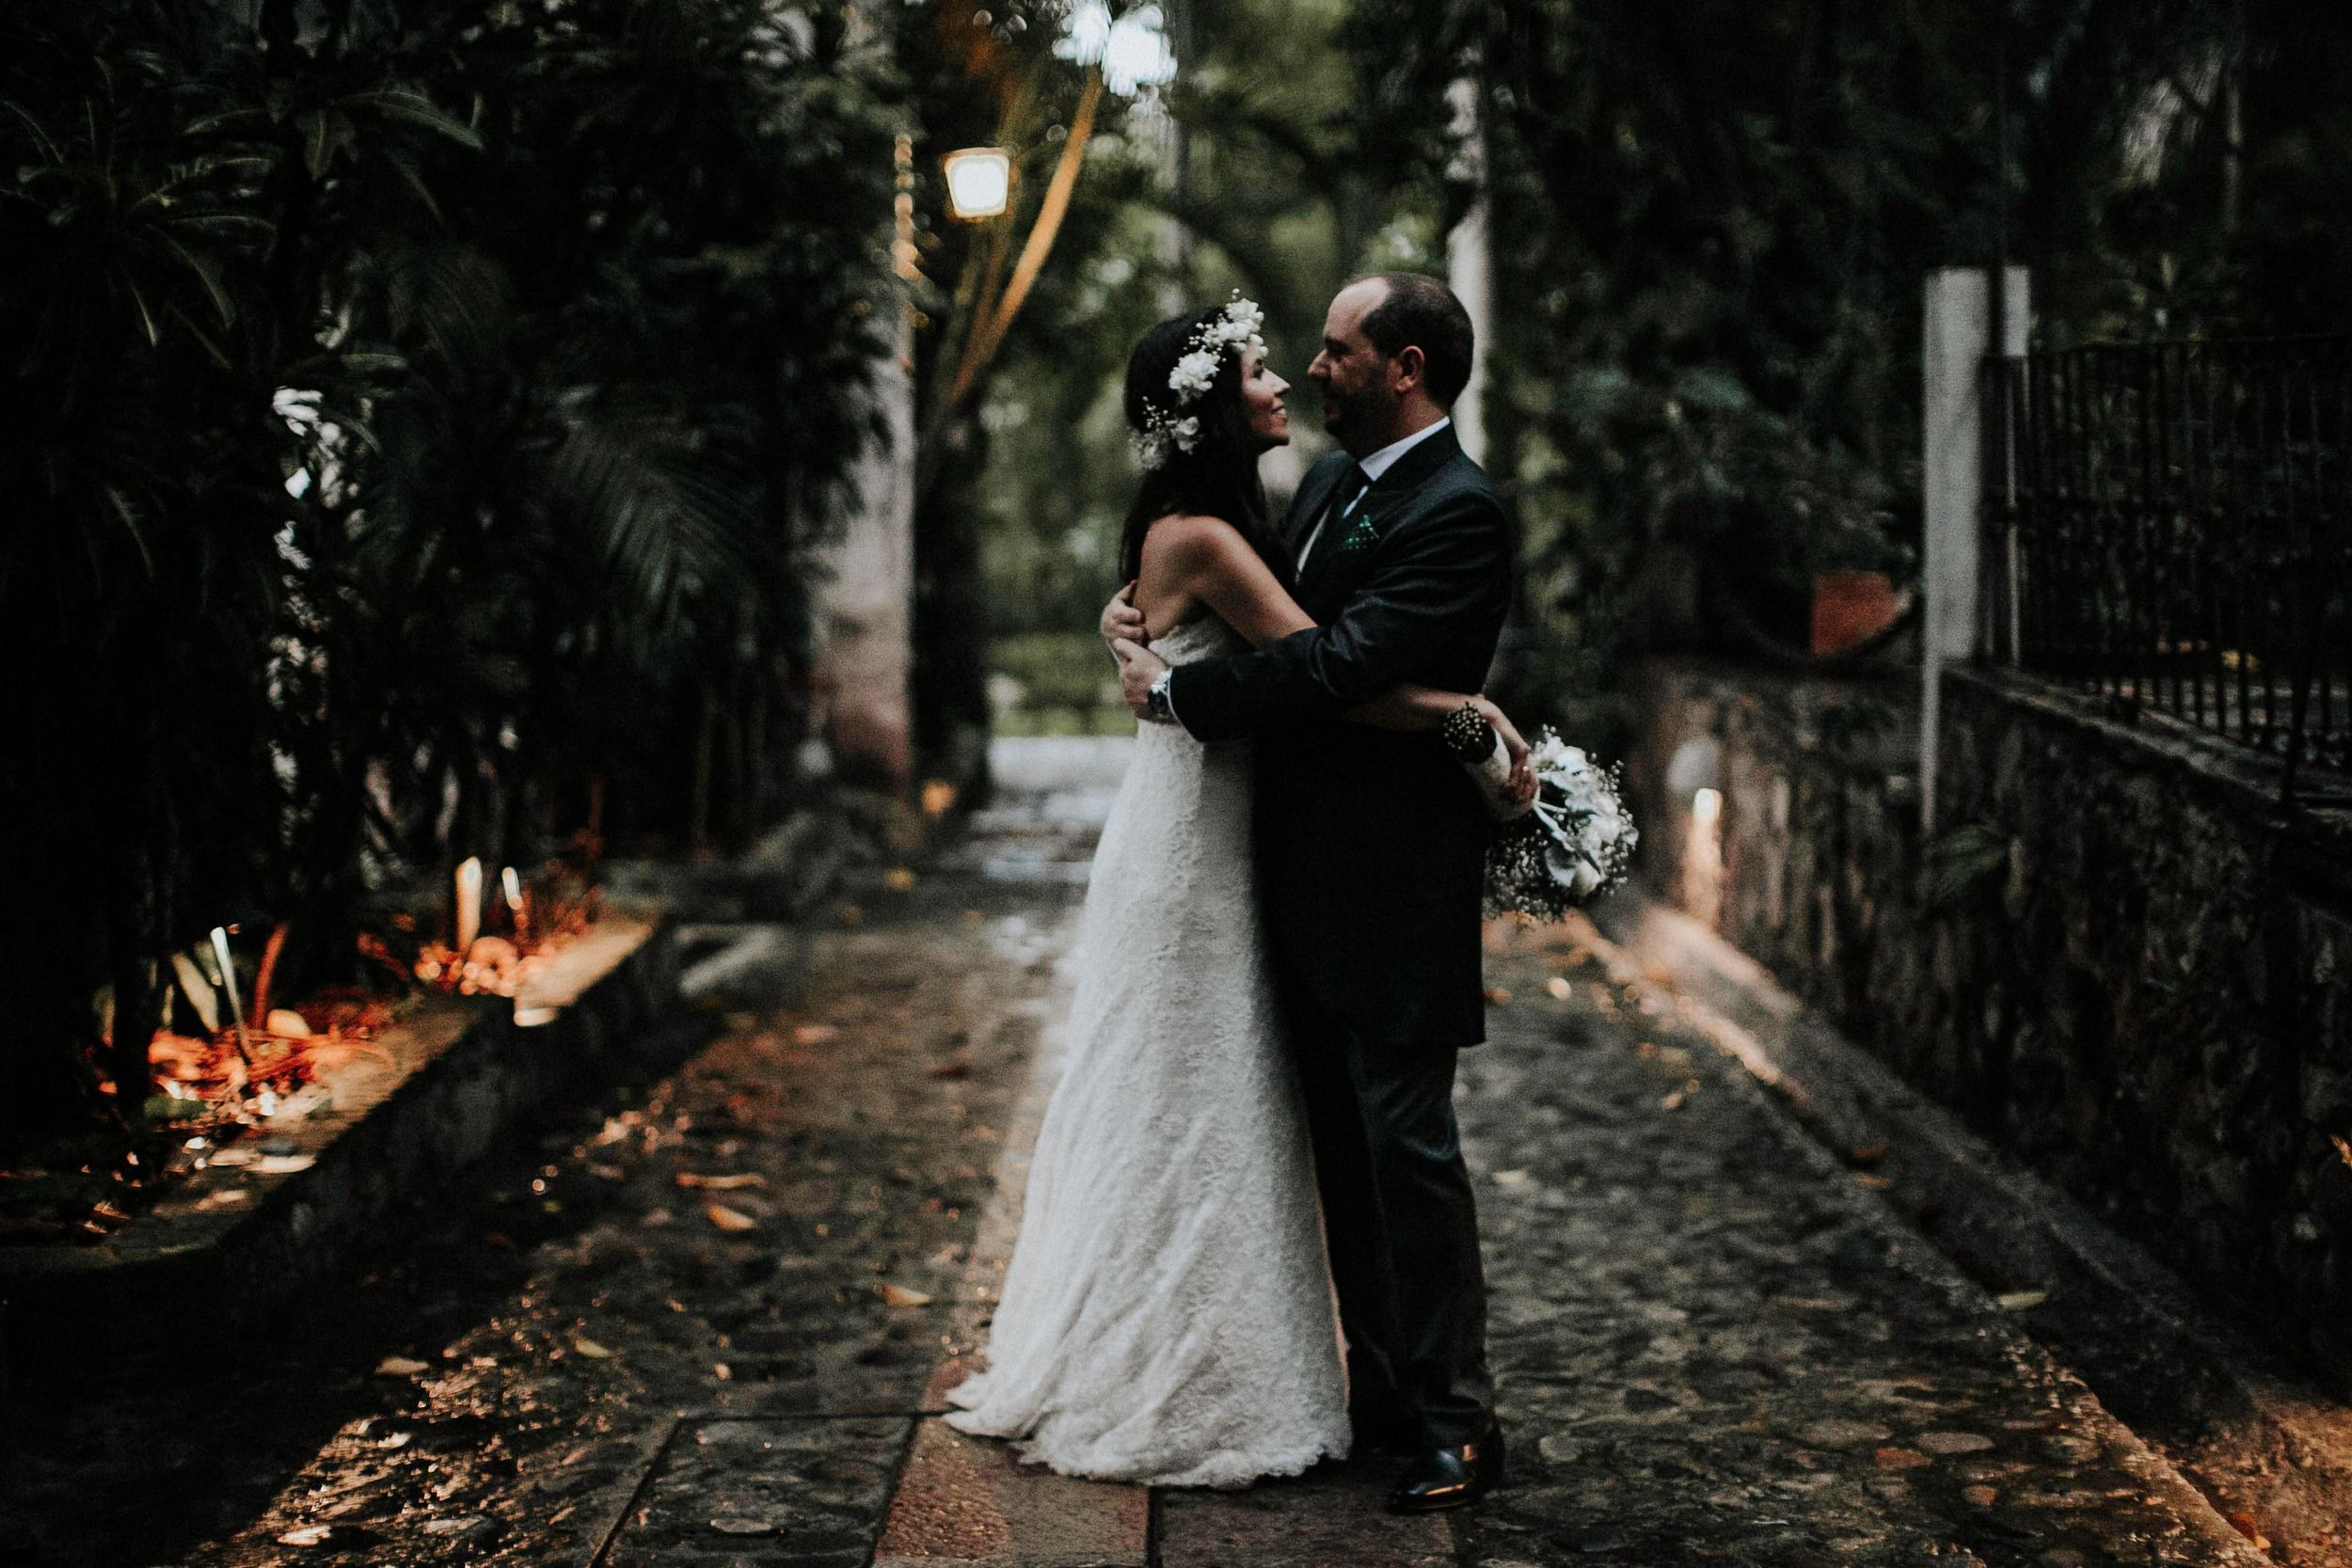 DJ8A9104-Editar-2alfonso_flores_destination_wedding_photographer_San_gabriel_de_las_palmas.jpg